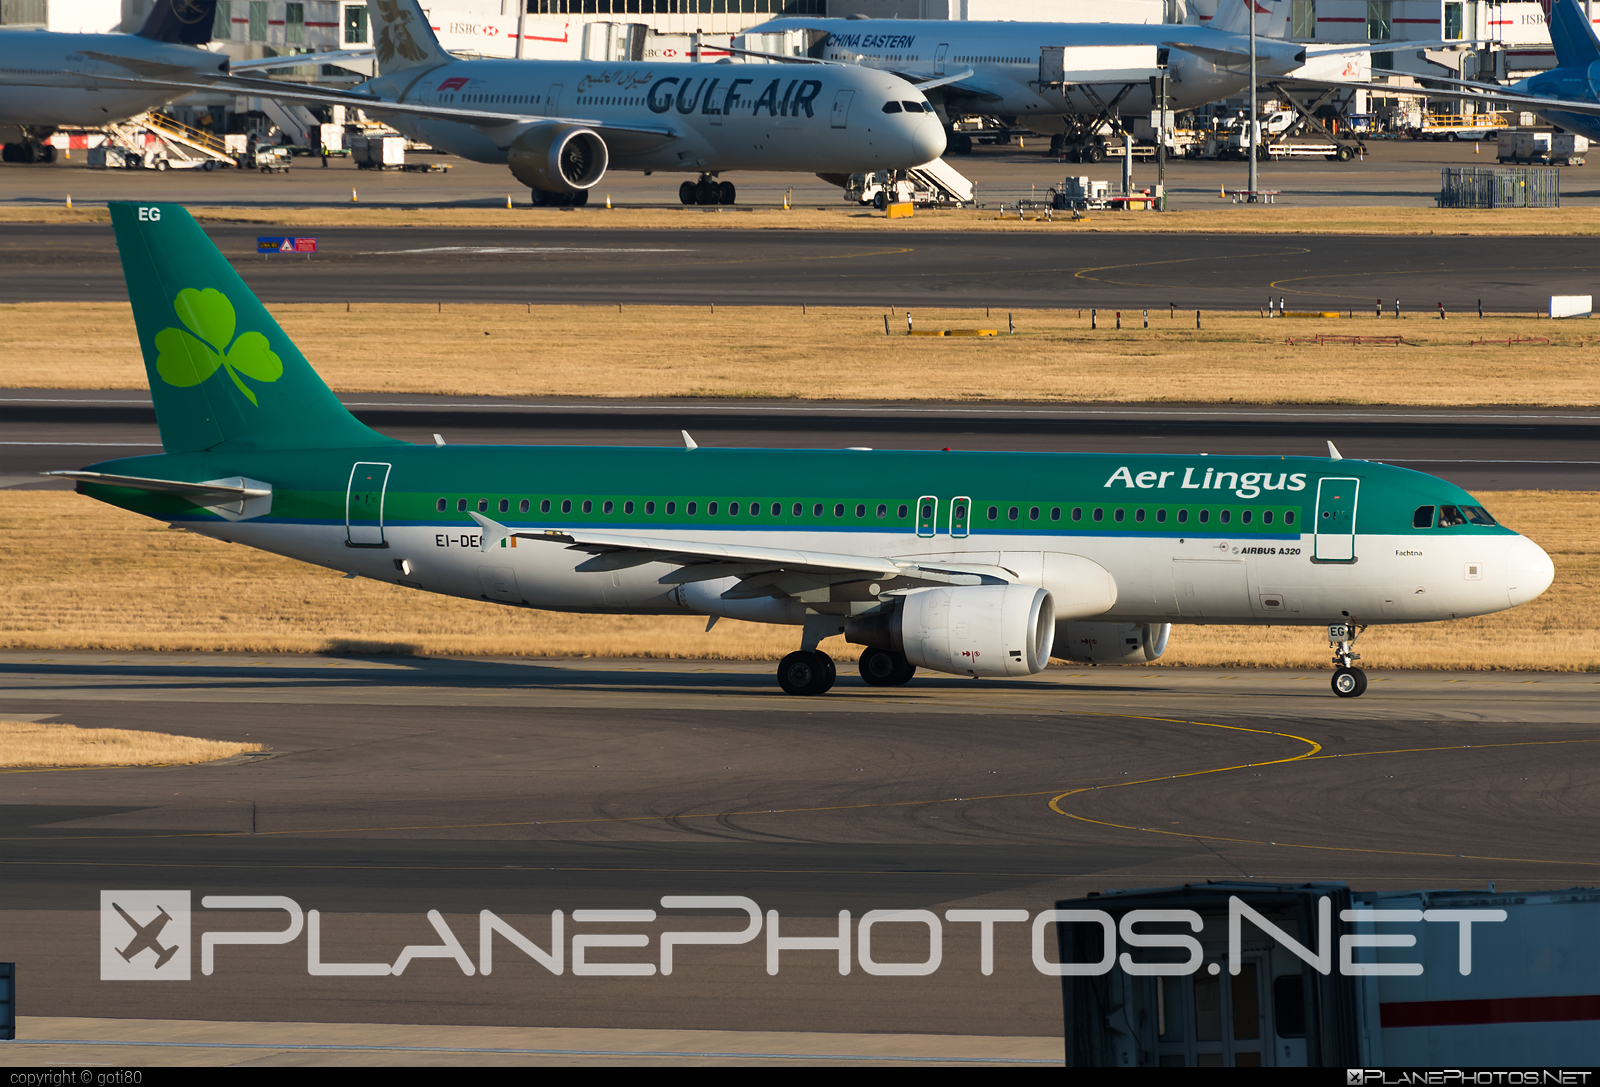 Airbus A320-214 - EI-DEG operated by Aer Lingus #a320 #a320family #aerlingus #airbus #airbus320